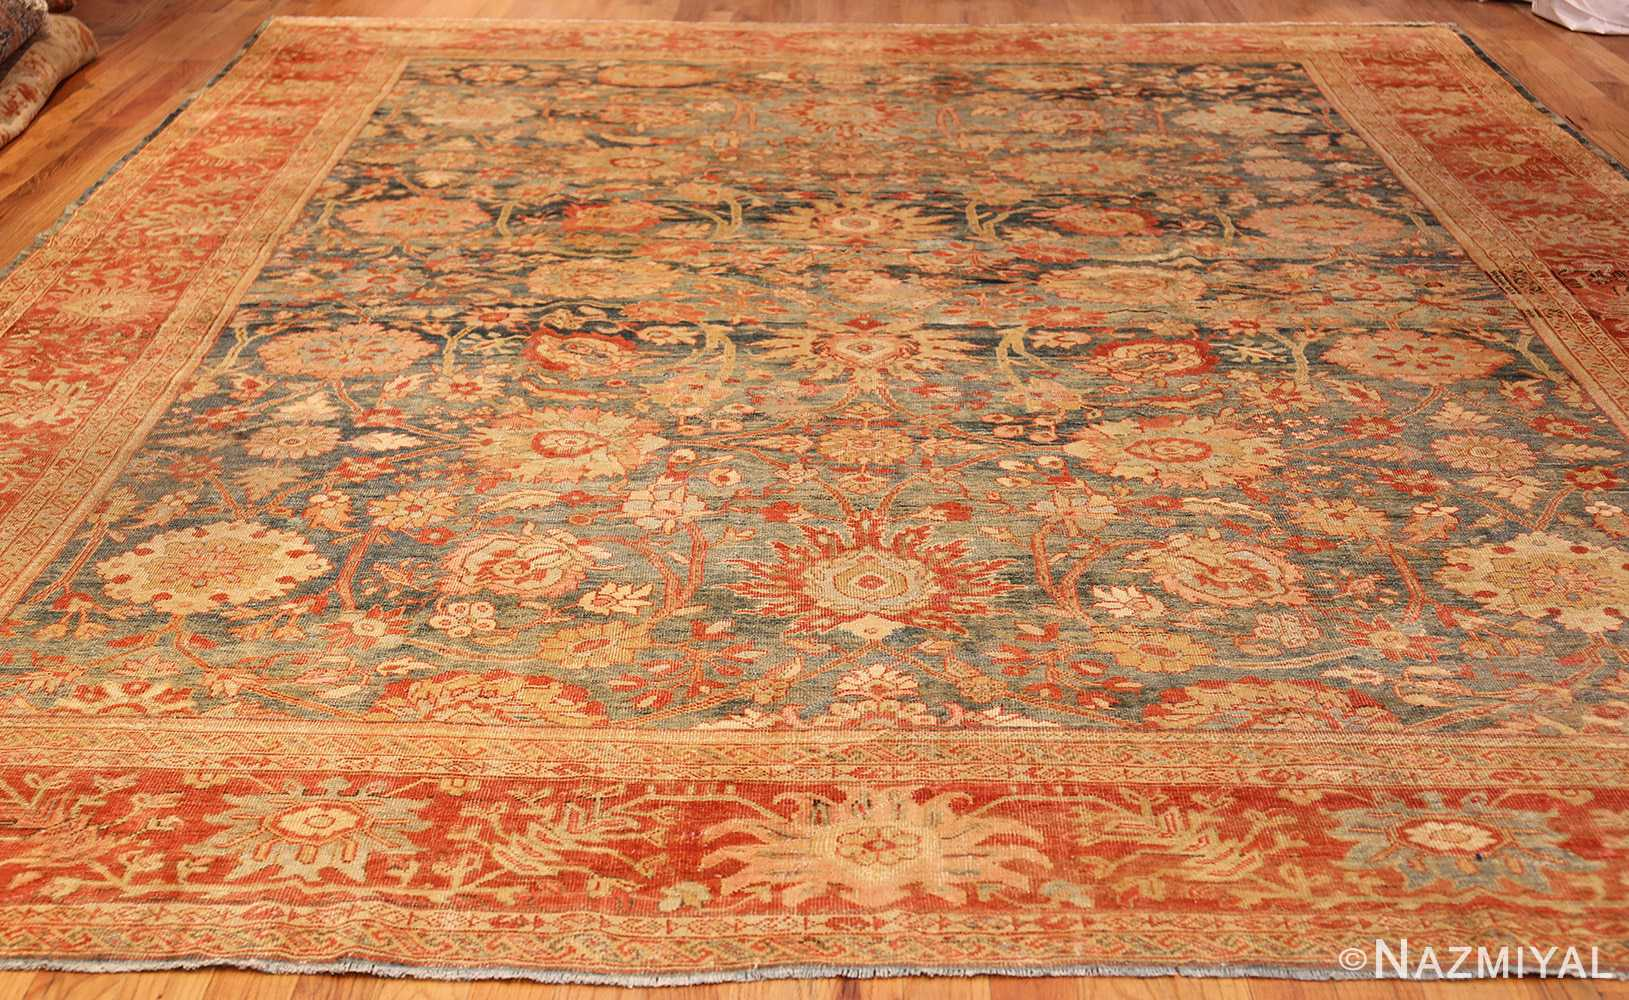 blue background antique sultanabad persian rug 49320 whole Nazmiyal